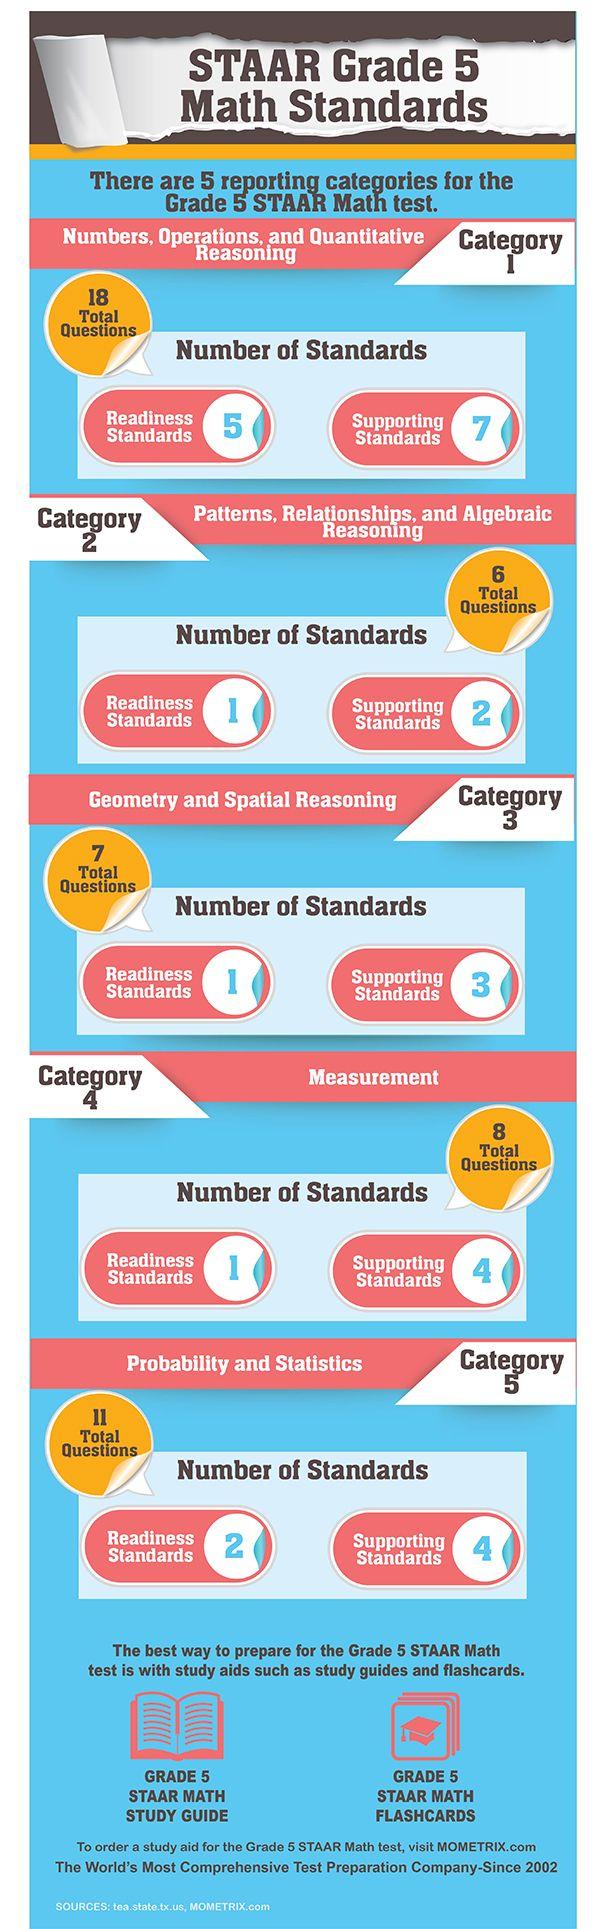 104 best Education Now images on Pinterest | Teaching math, School ...